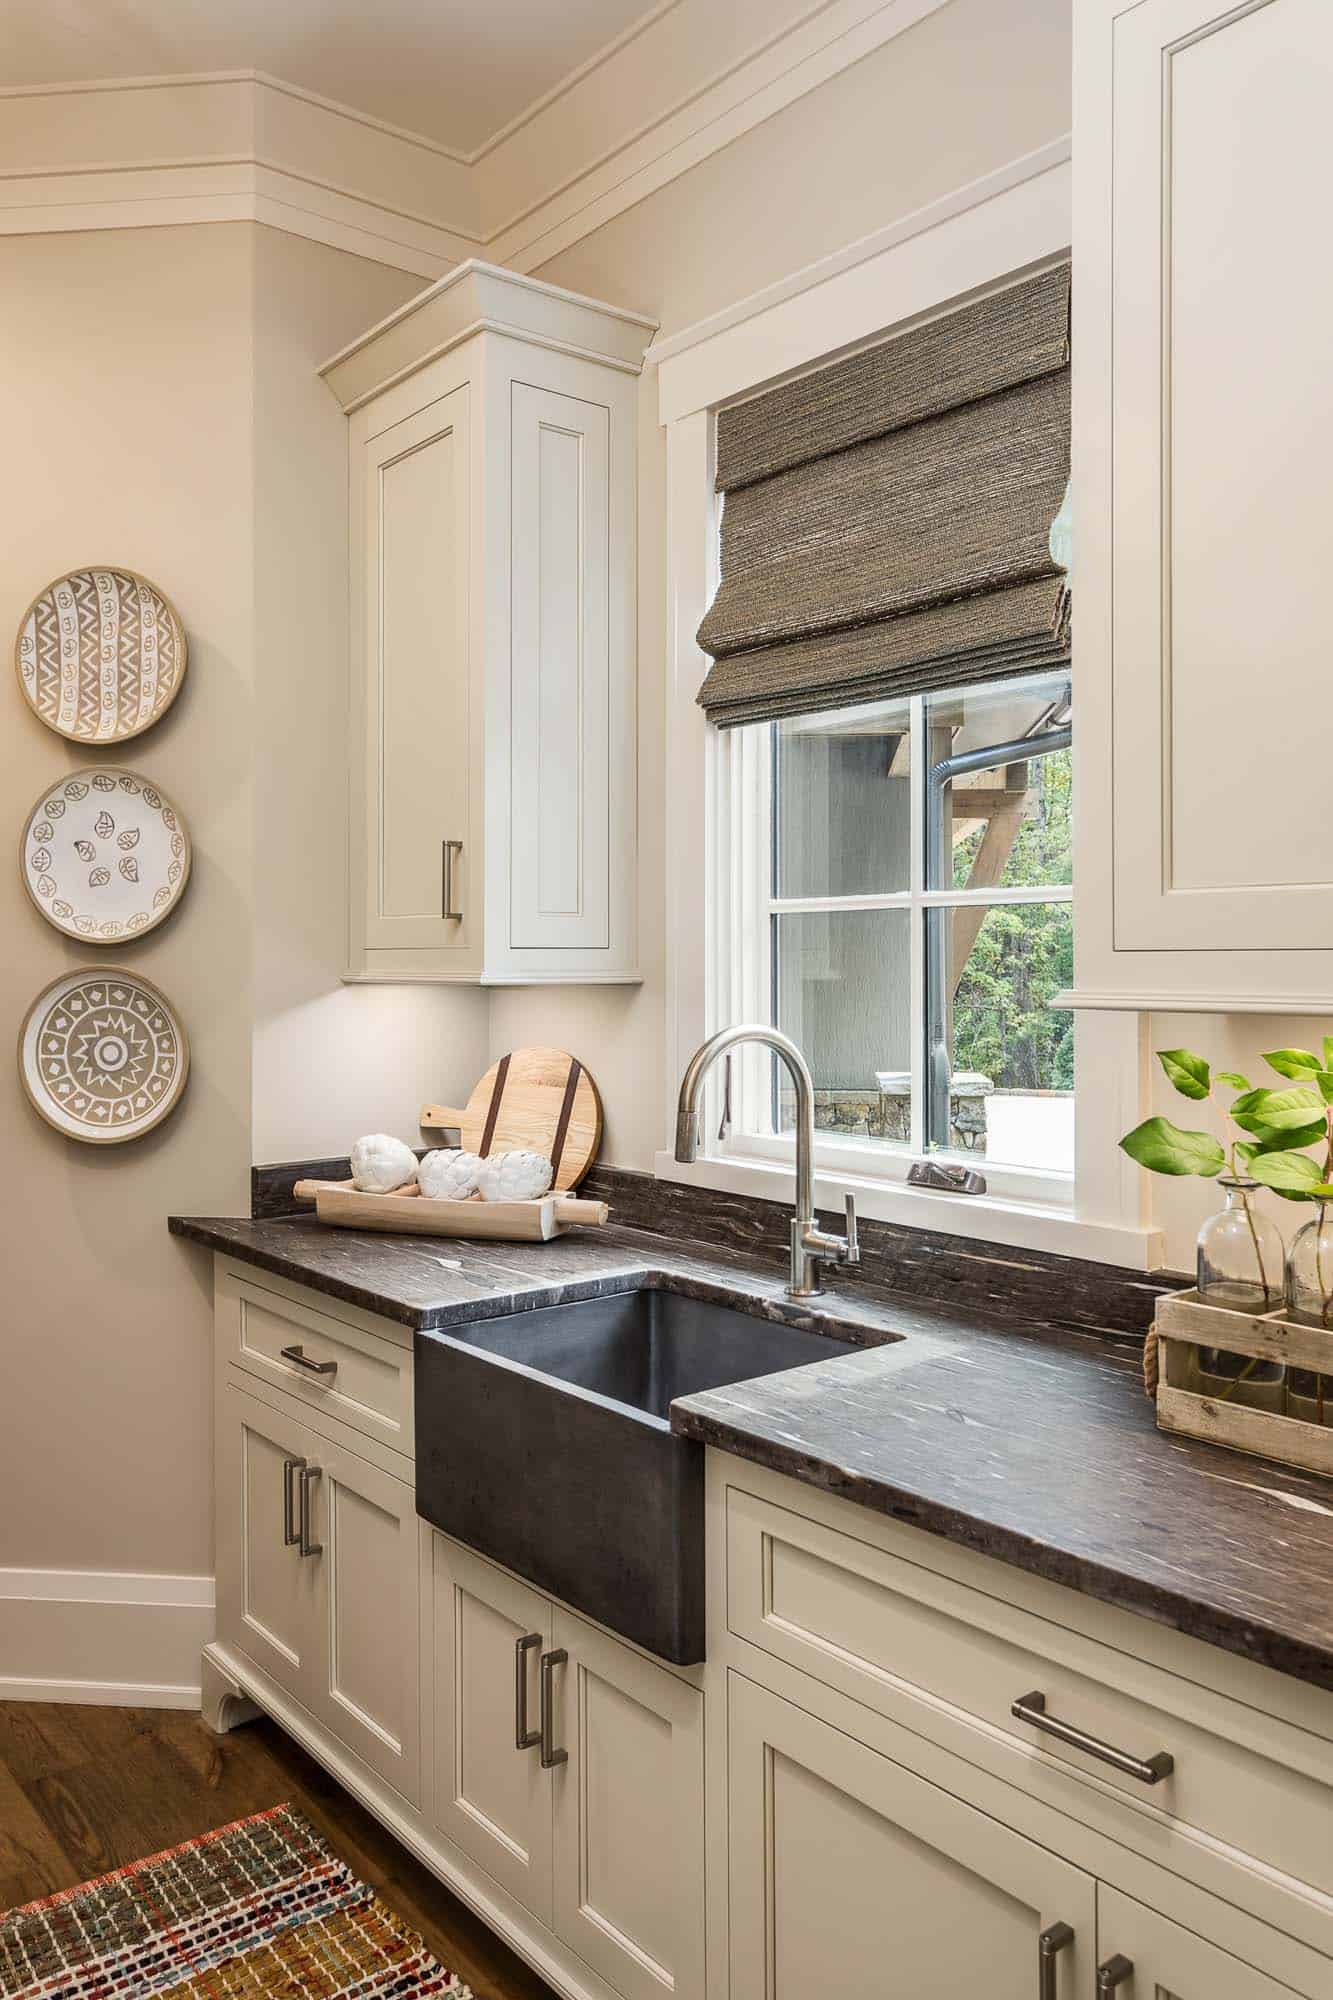 cuisine-maison-modele-contemporaine